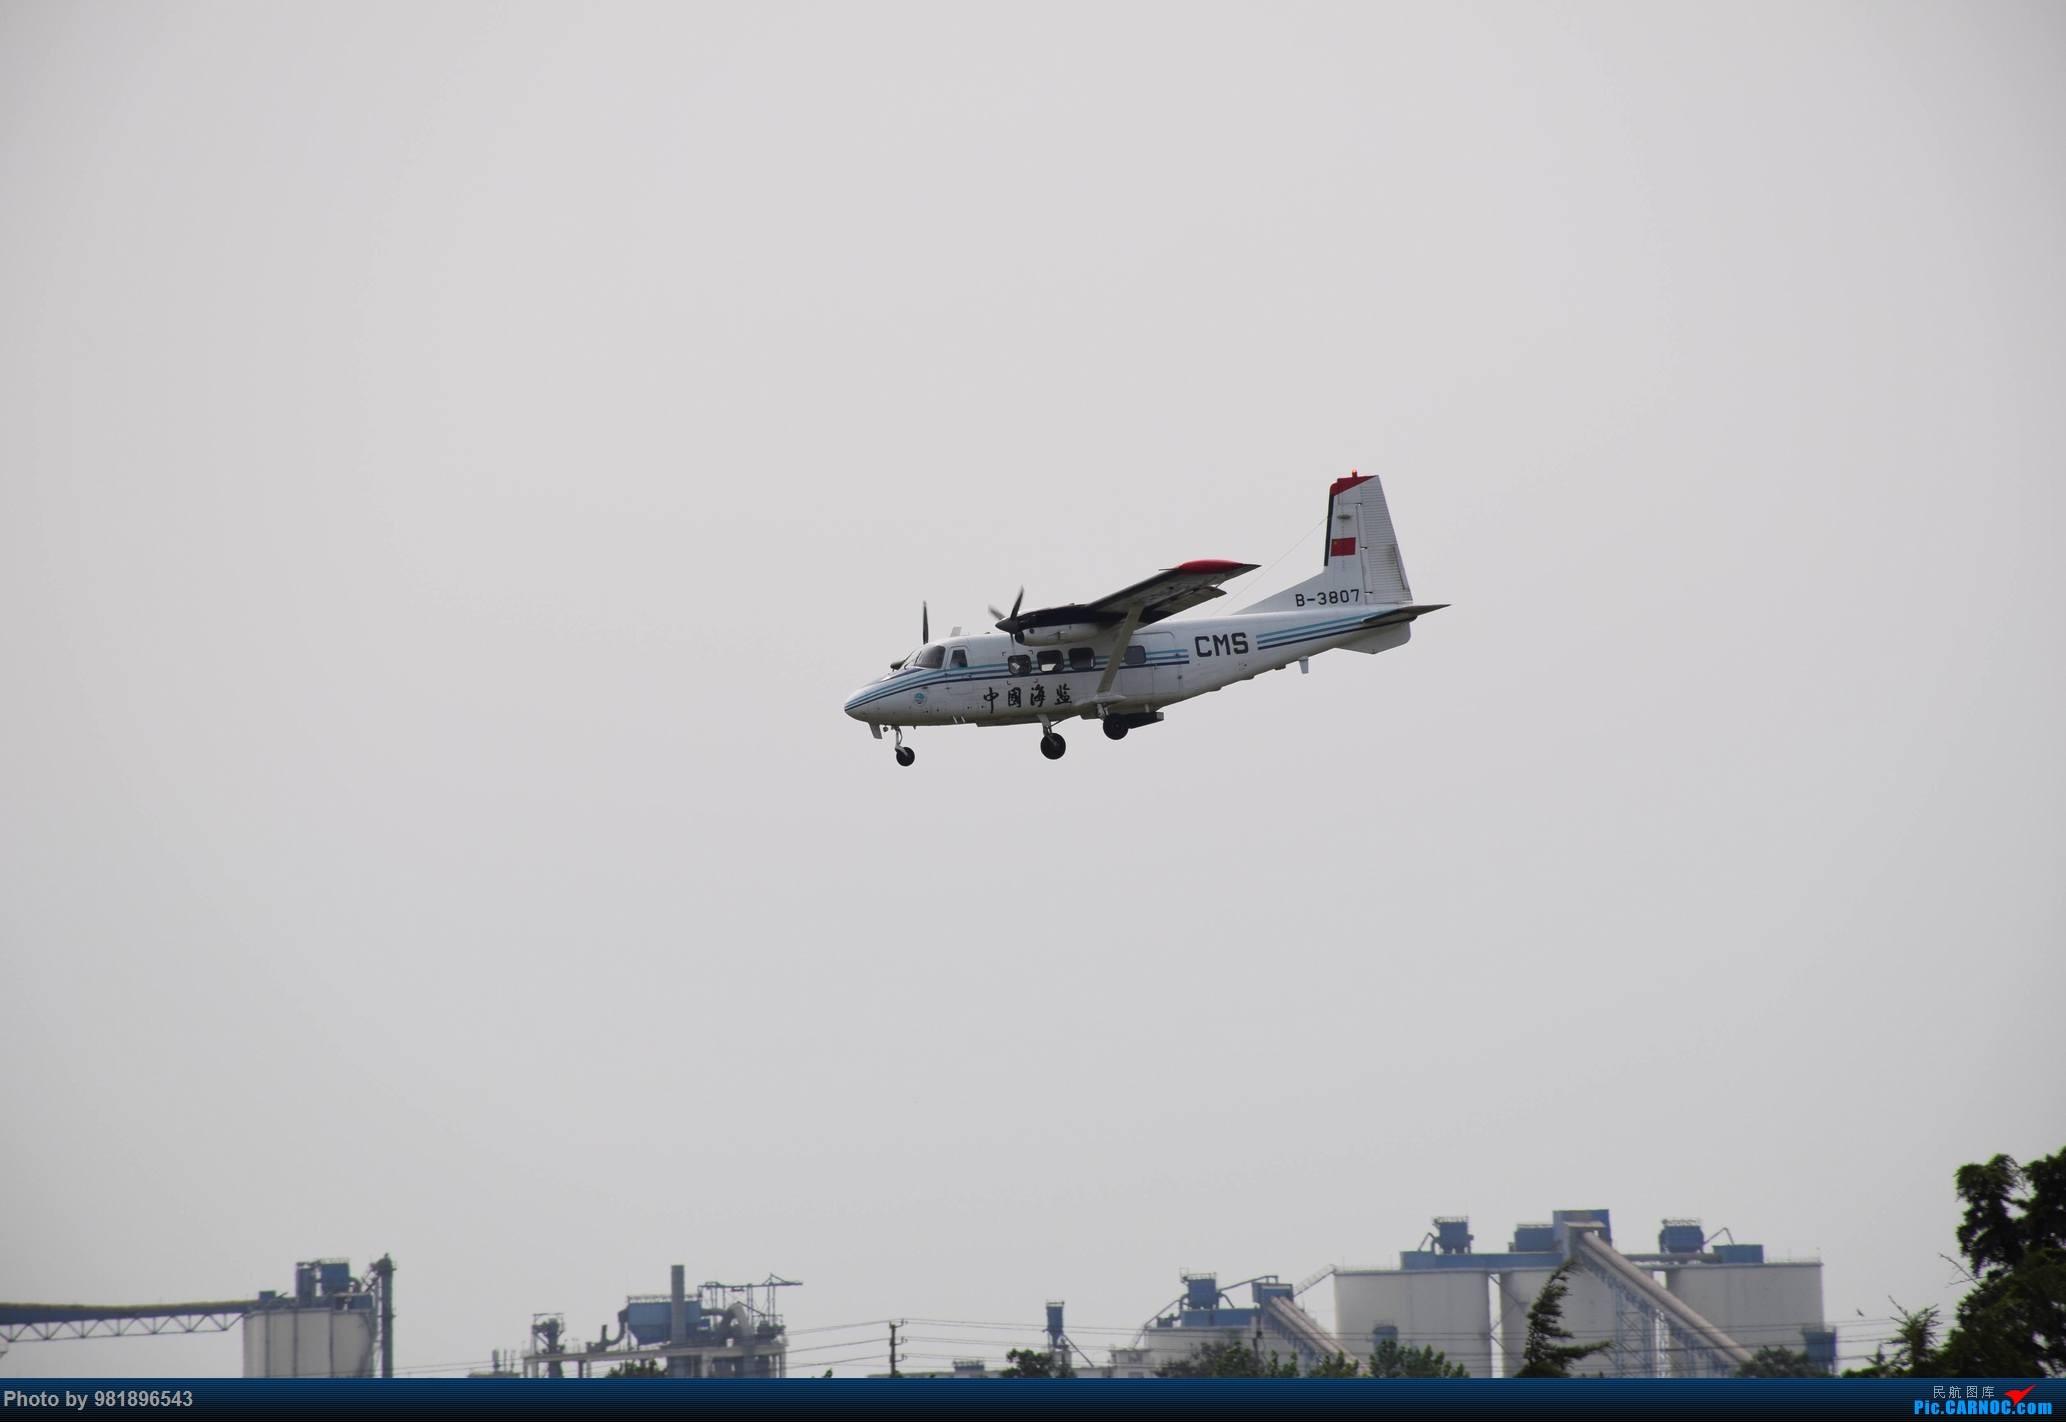 Re:[原创]【新人拍机】青岛周日的一天 HAFEI Y12II B-3807 中国青岛流亭国际机场